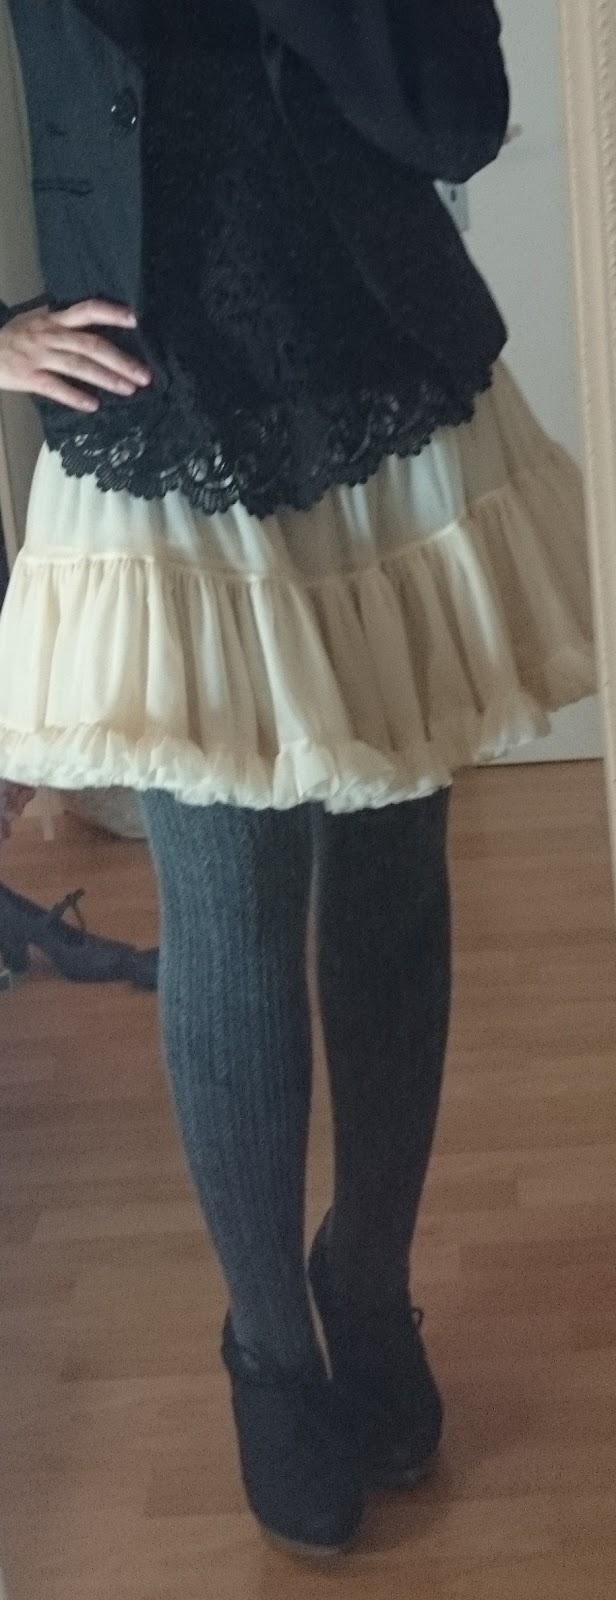 Schwarze Spitze und Petticoat